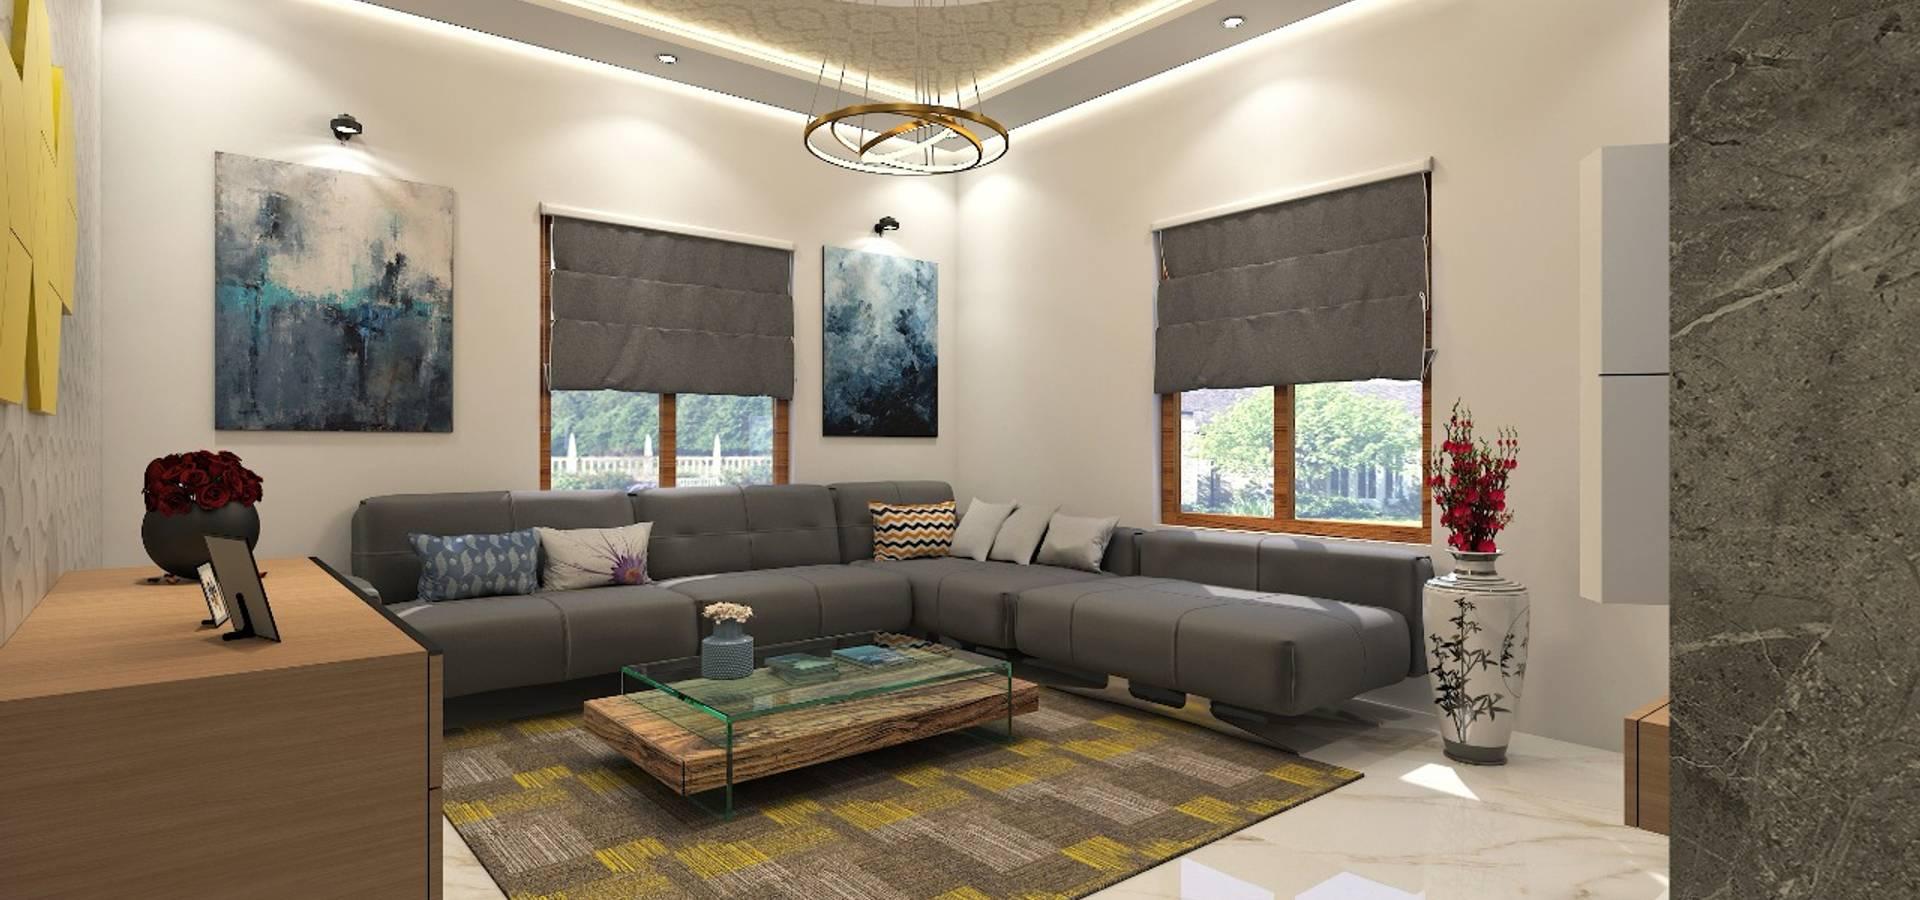 Dezicorp Architects & Interiors